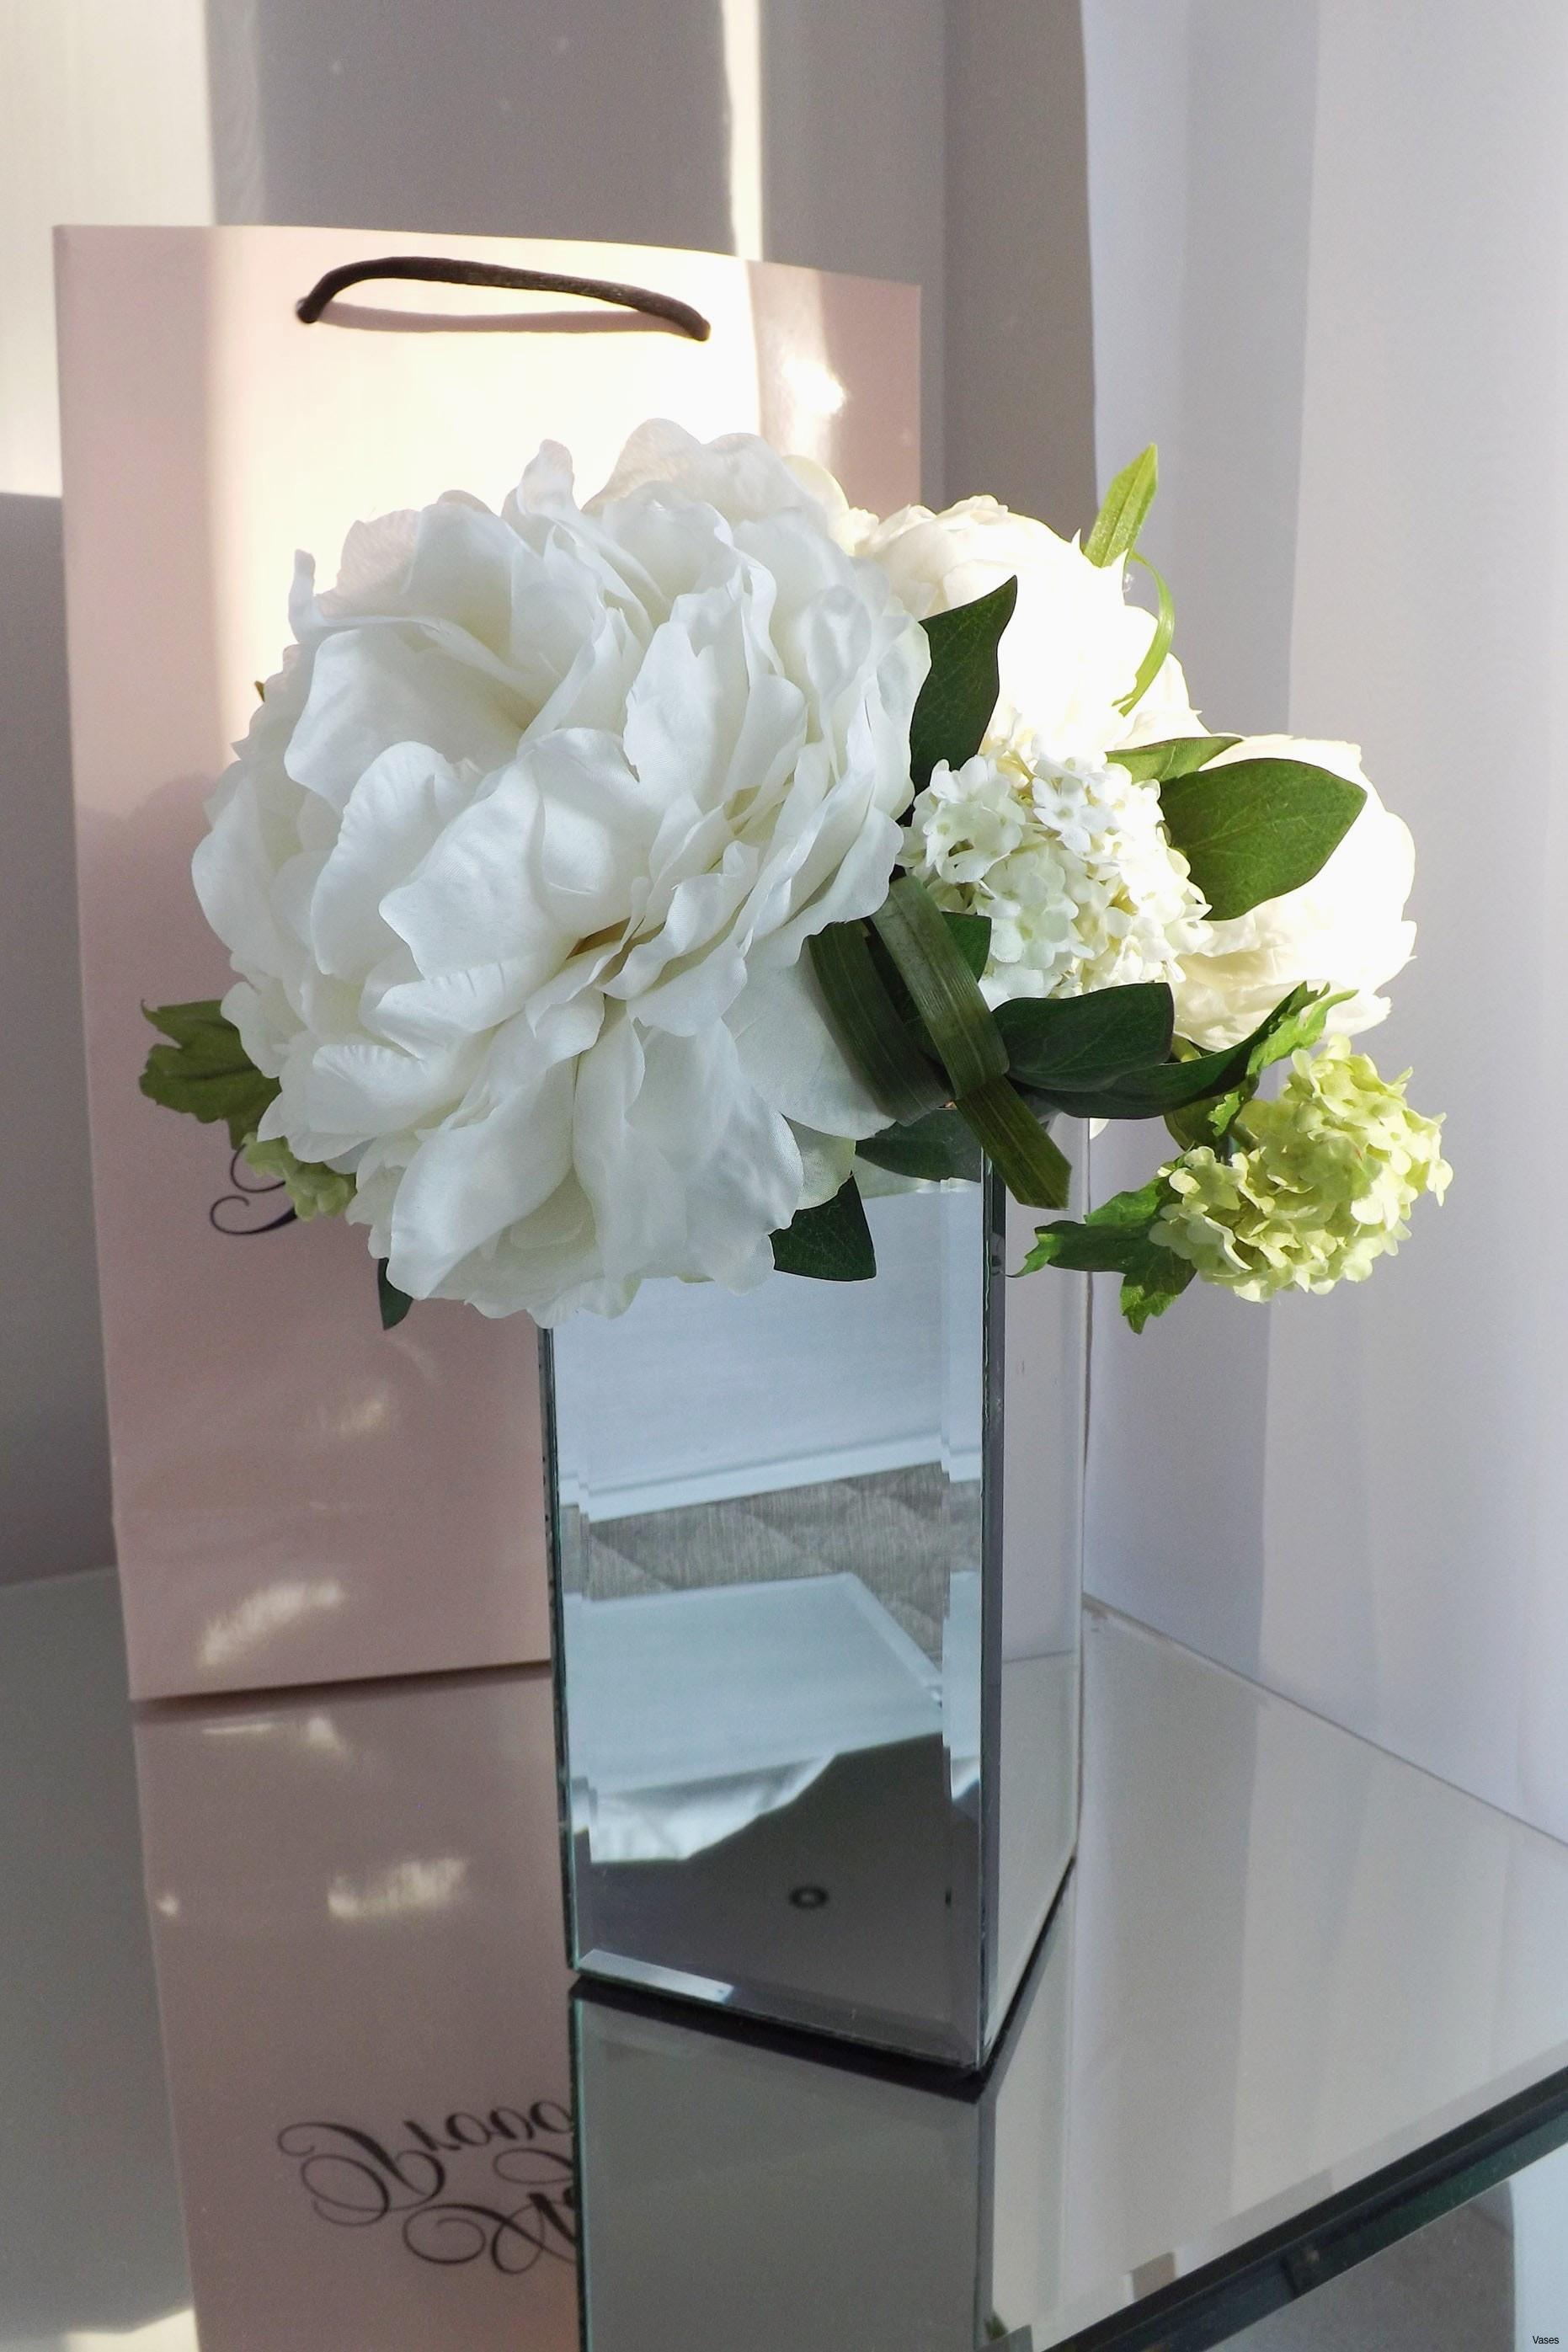 large clear hurricane vase of vases hobby lobby www topsimages com for hobby lobby dining table genuine metal vases mirrored mosaic vase votivei hobby lobby canada jpg 1862x2793